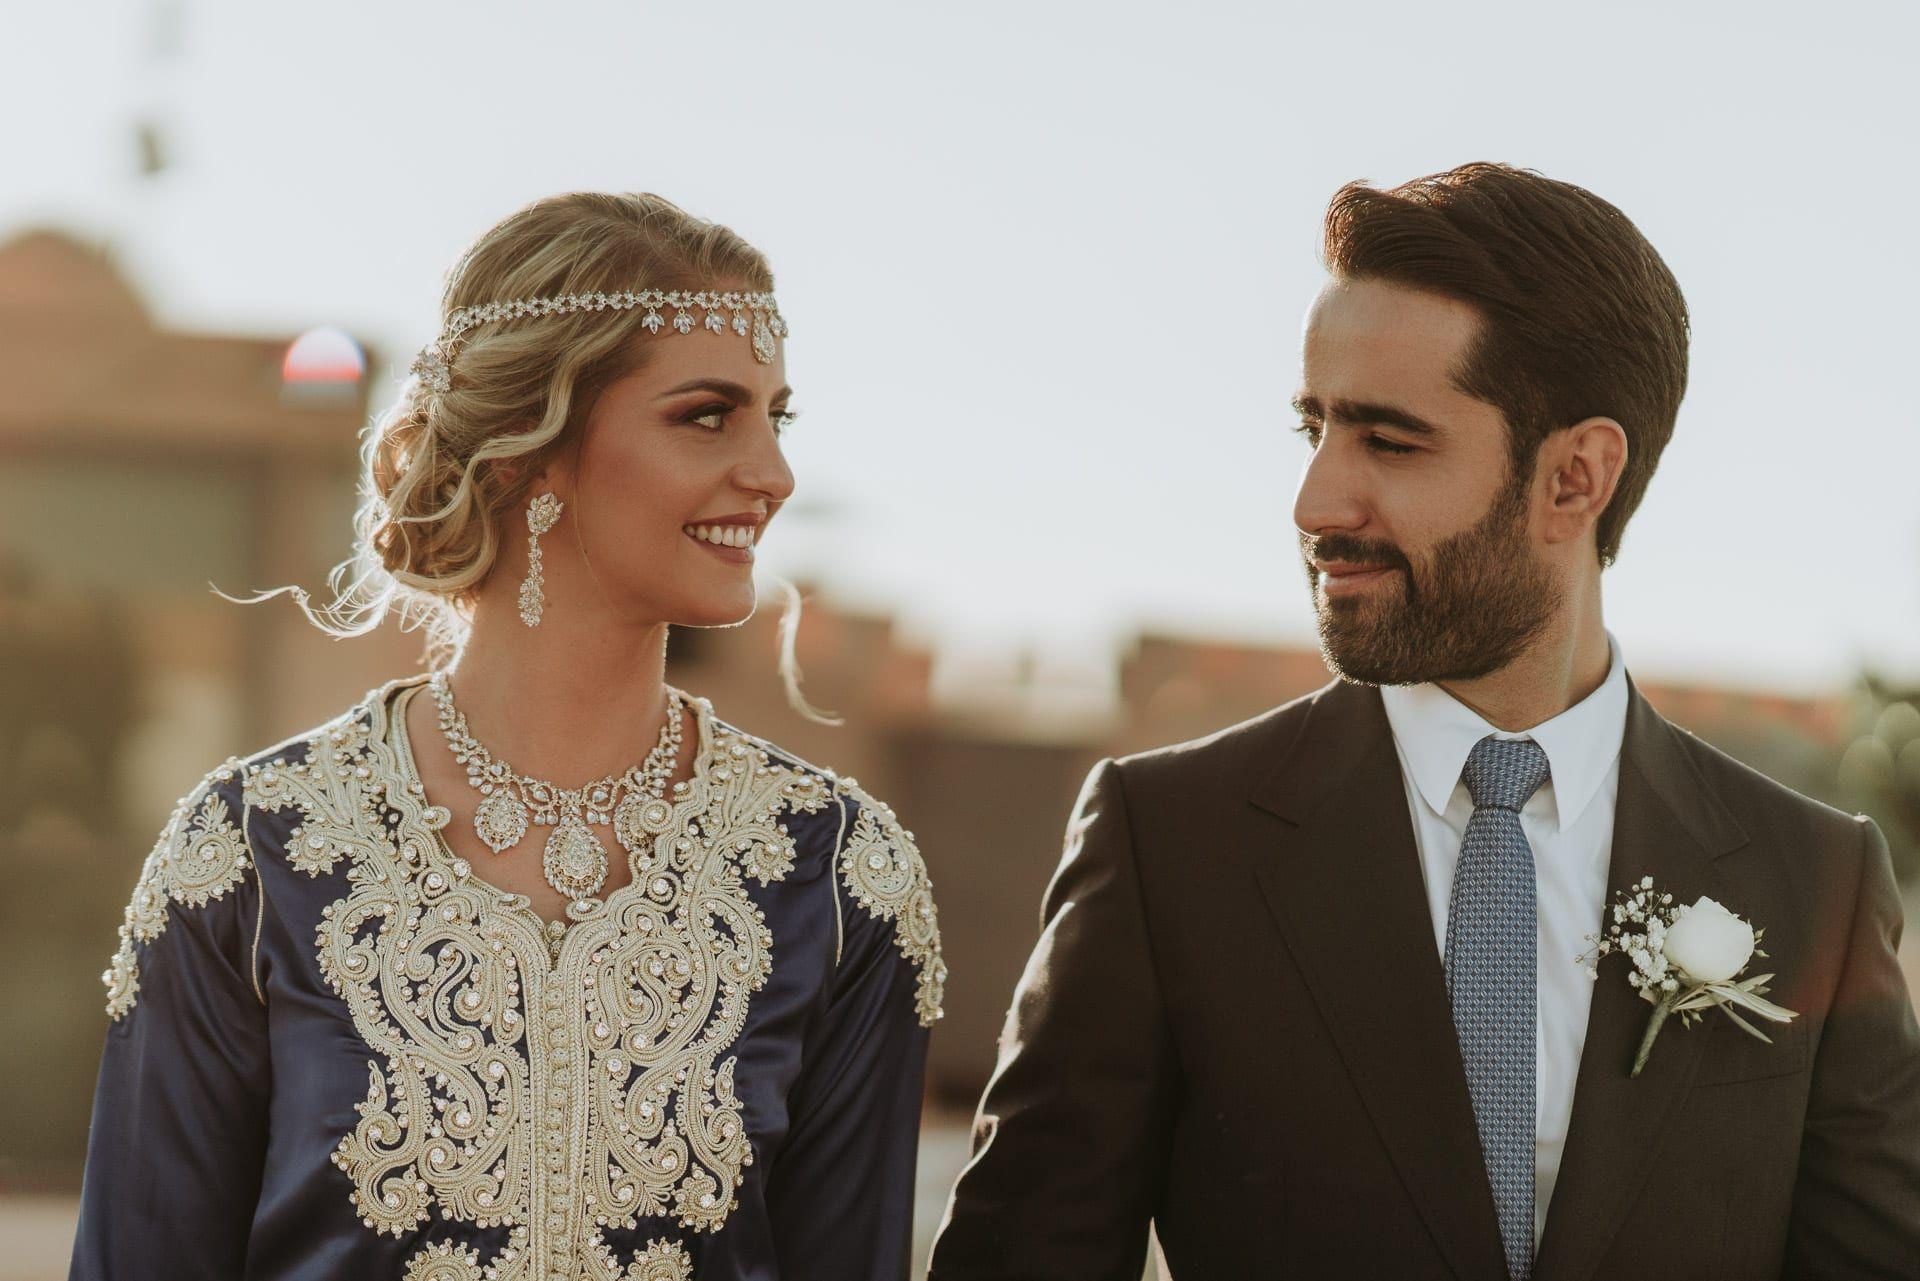 Moroccan Wedding Photographer In Marrakech Morocco In 2020 Moroccan Wedding Mixed Marriage Wedding